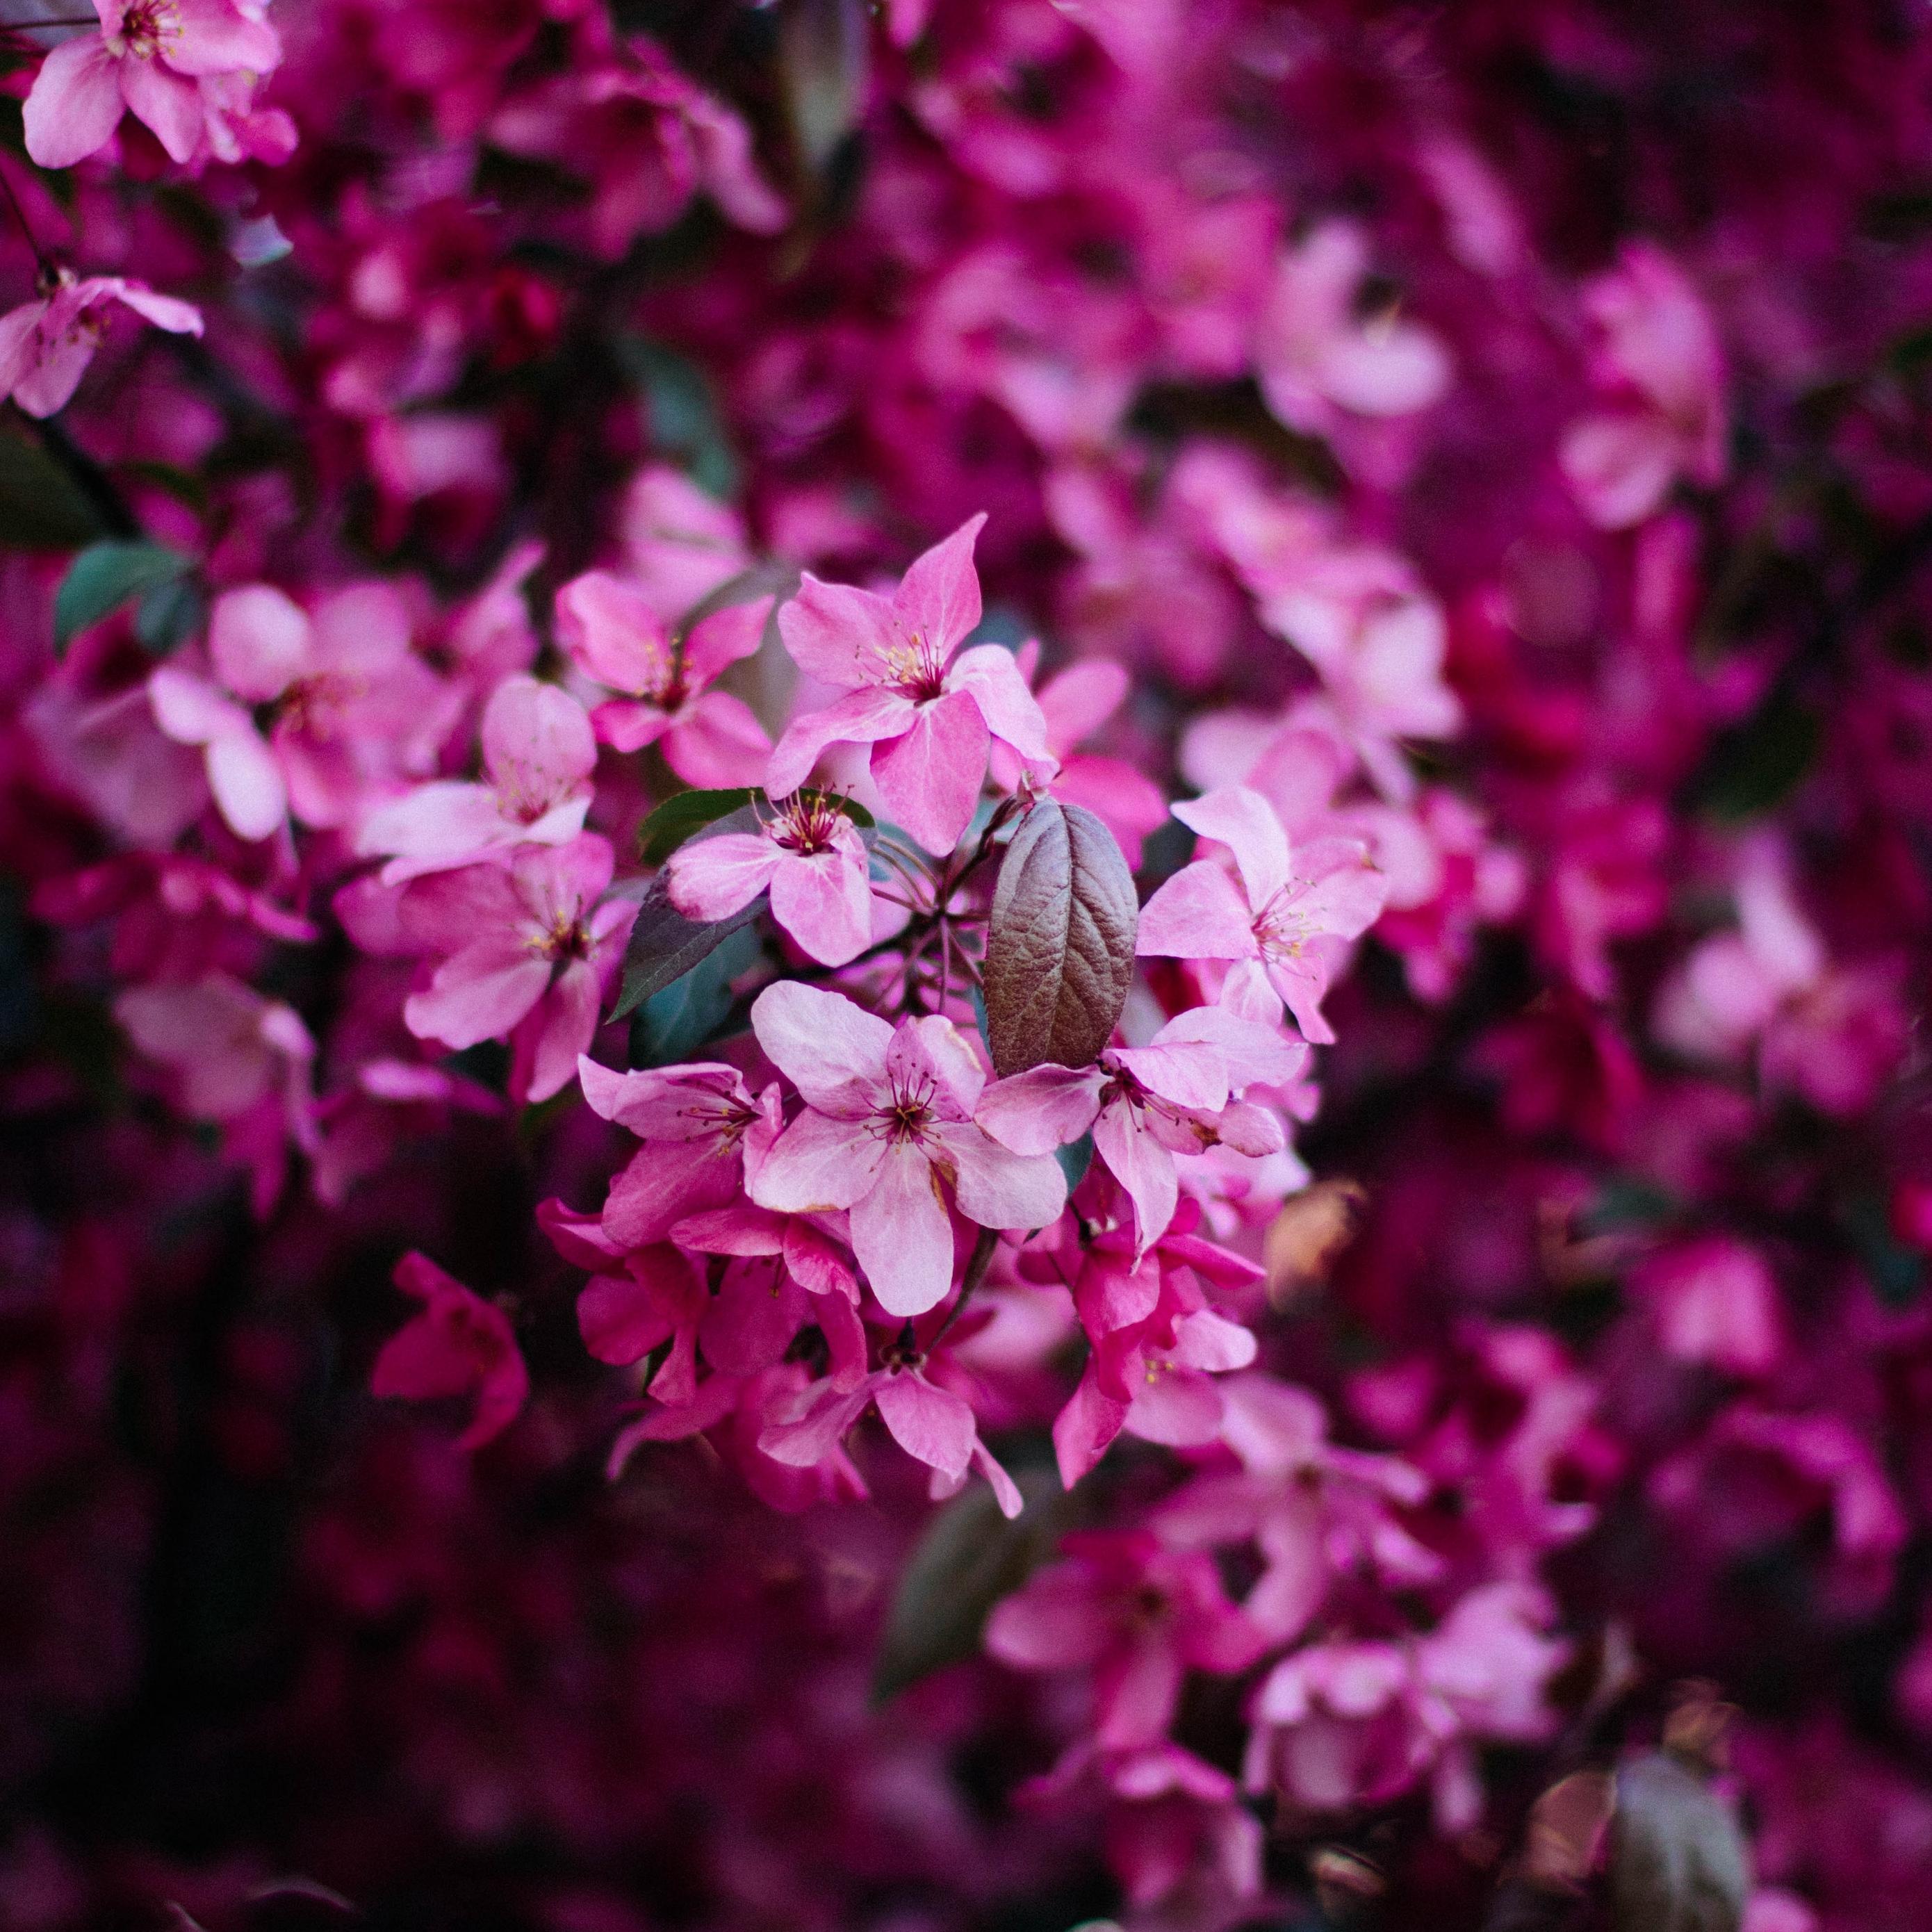 Download wallpaper 2780x2780 flowers bloom pink bush branch 2780x2780